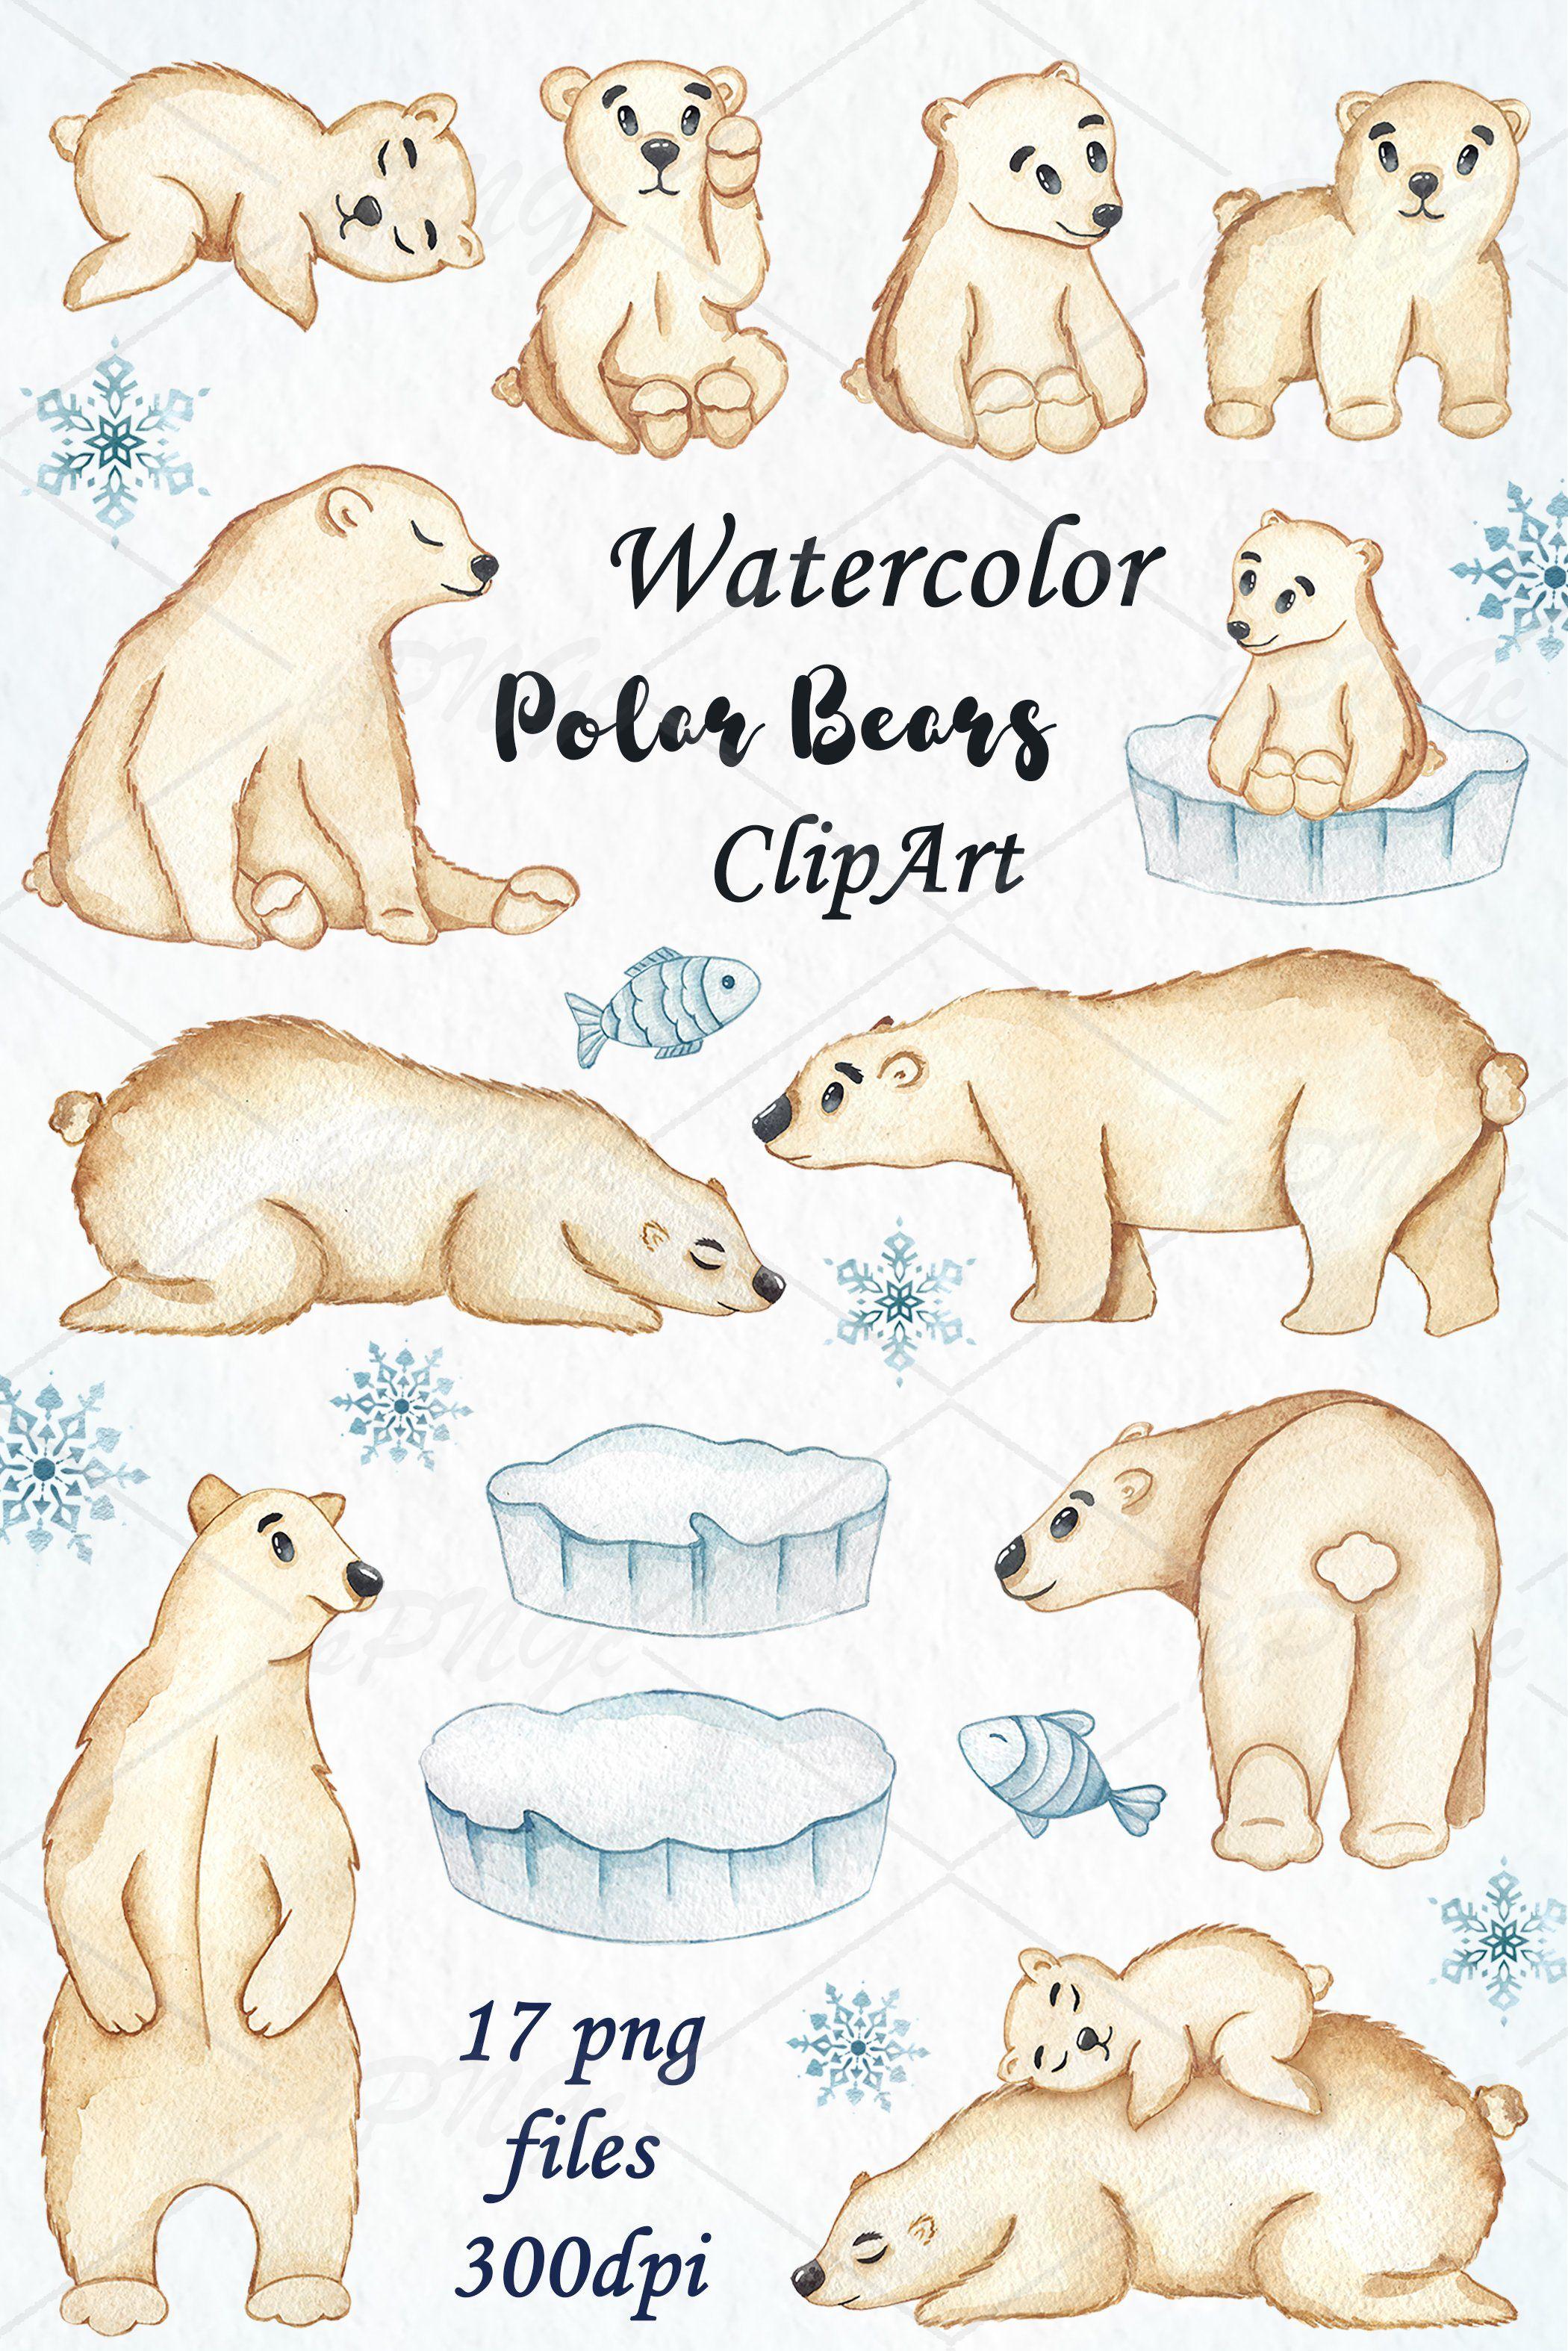 Watercolor Polar Bears Clipart By Passionpngcreation On Creativemarket Bear Clipart Polar Bear Bear